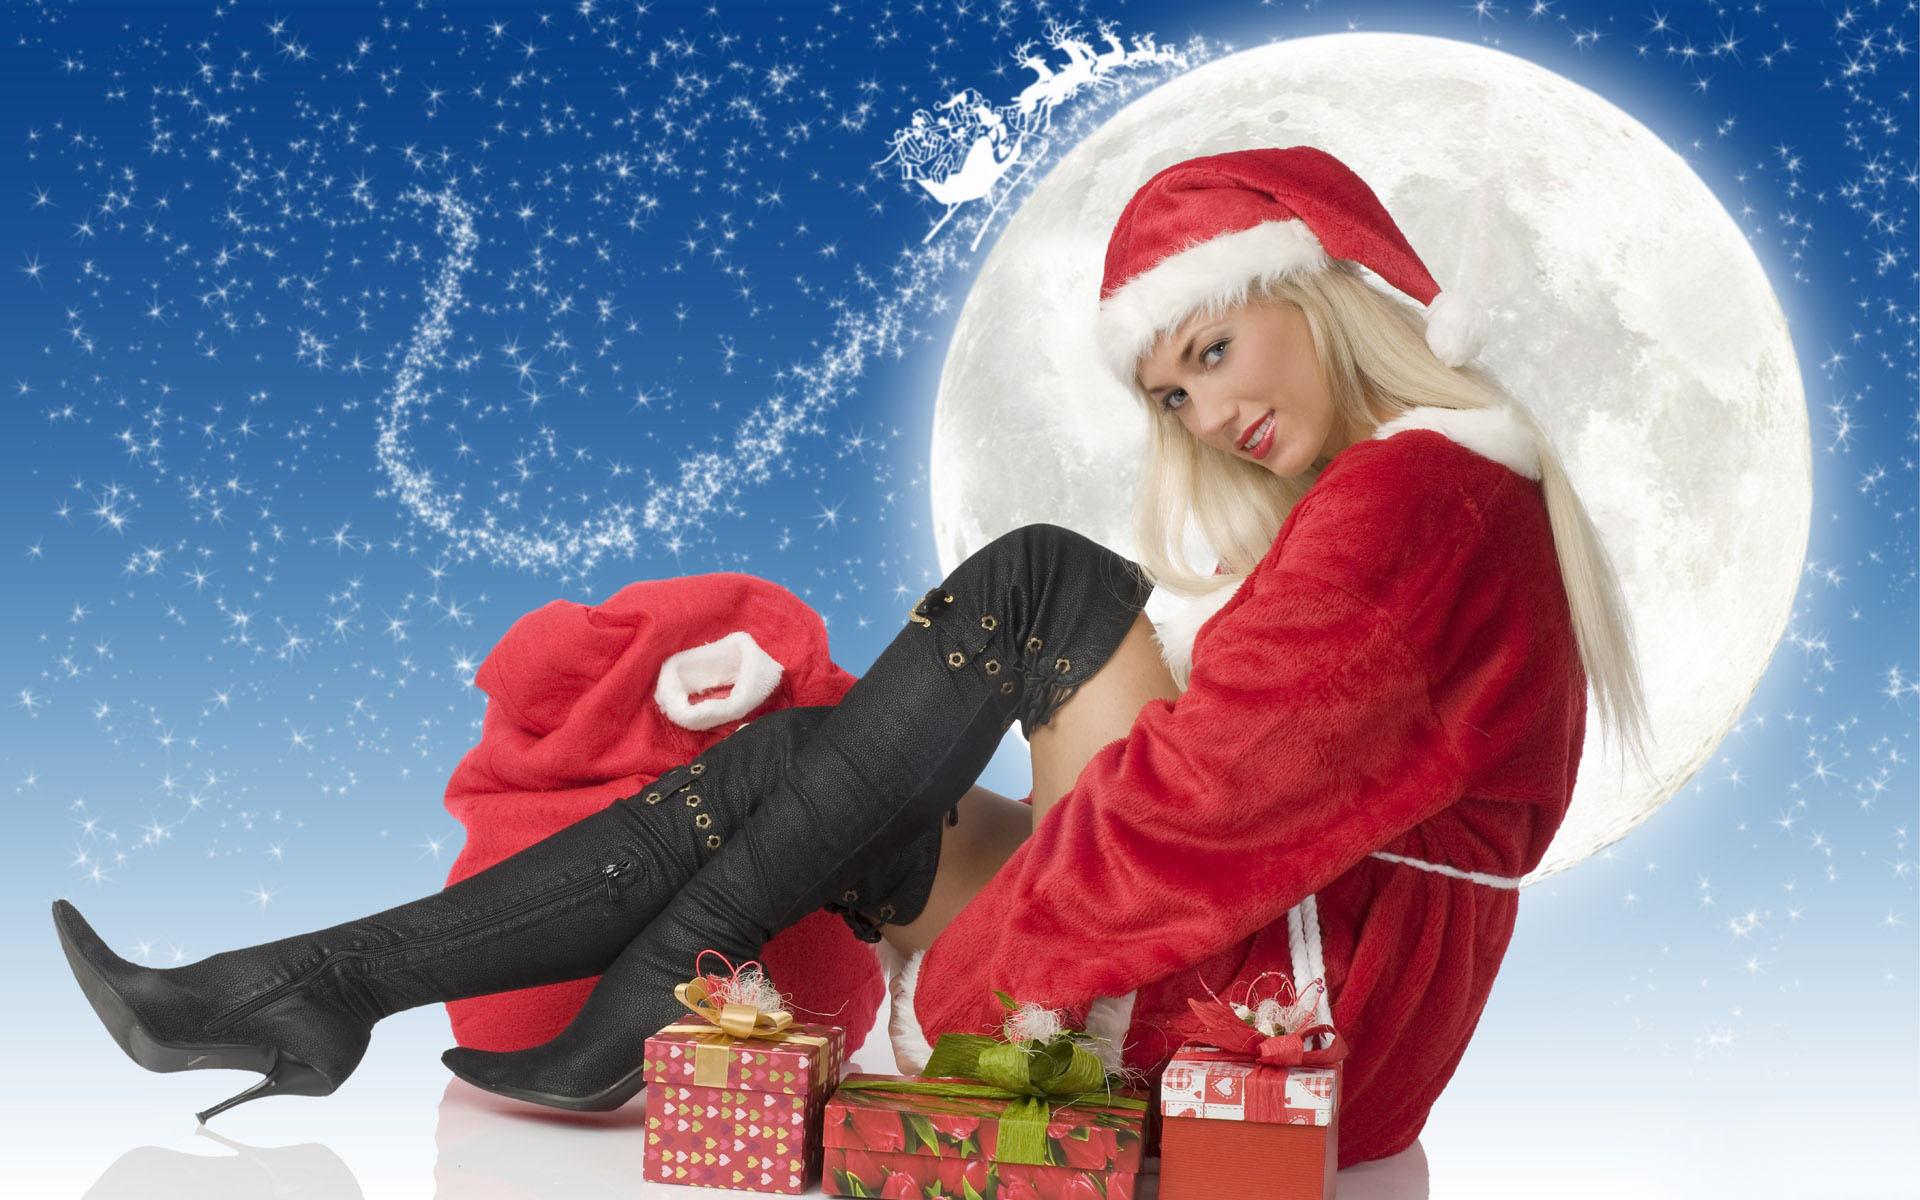 Funny Christmas Backgrounds - WallpaperSafari